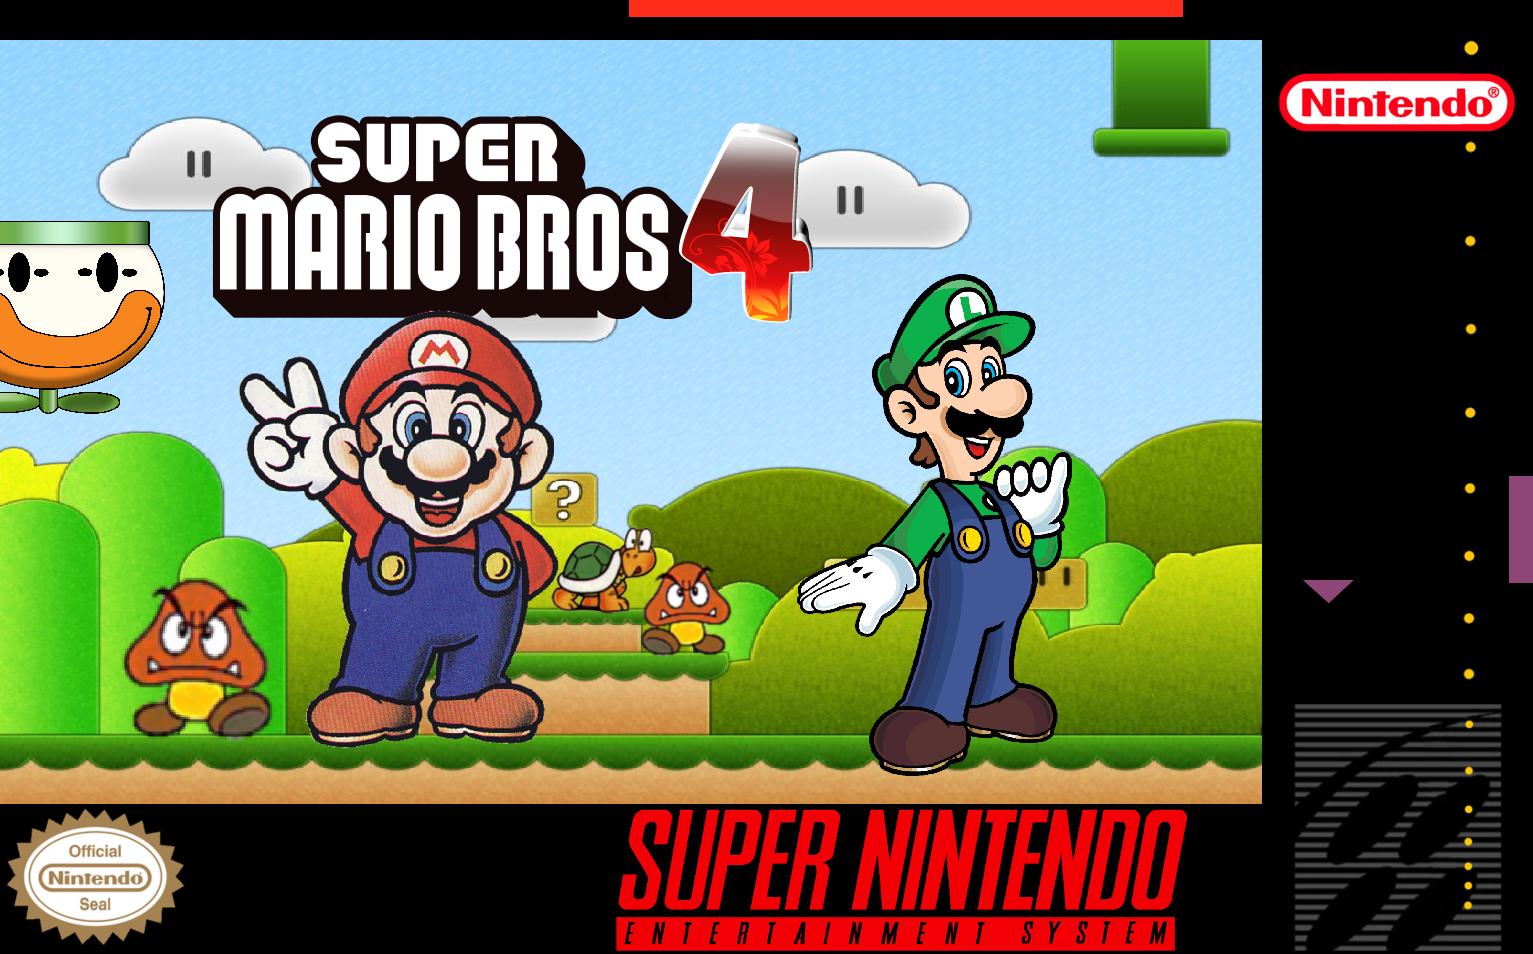 Super Mario Bros 4 Fantendo Nintendo Fanon Wiki Fandom Powered By Wikia